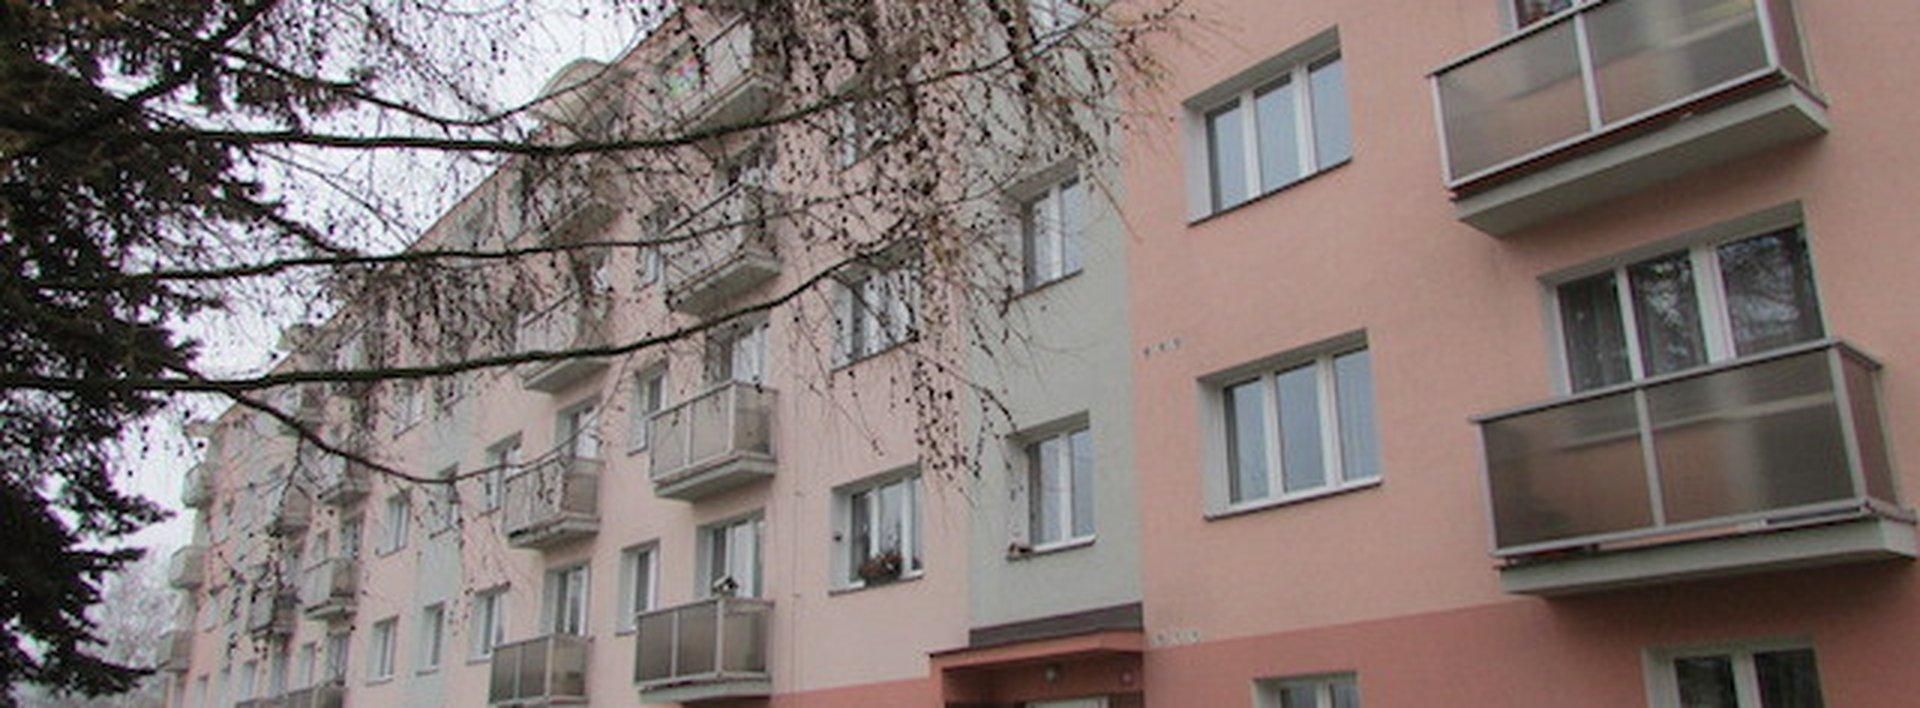 Byt 2+1 s balkonem, 55m² v cihlovém domě, Liberec - Pilínkov, Ev.č.: N46555